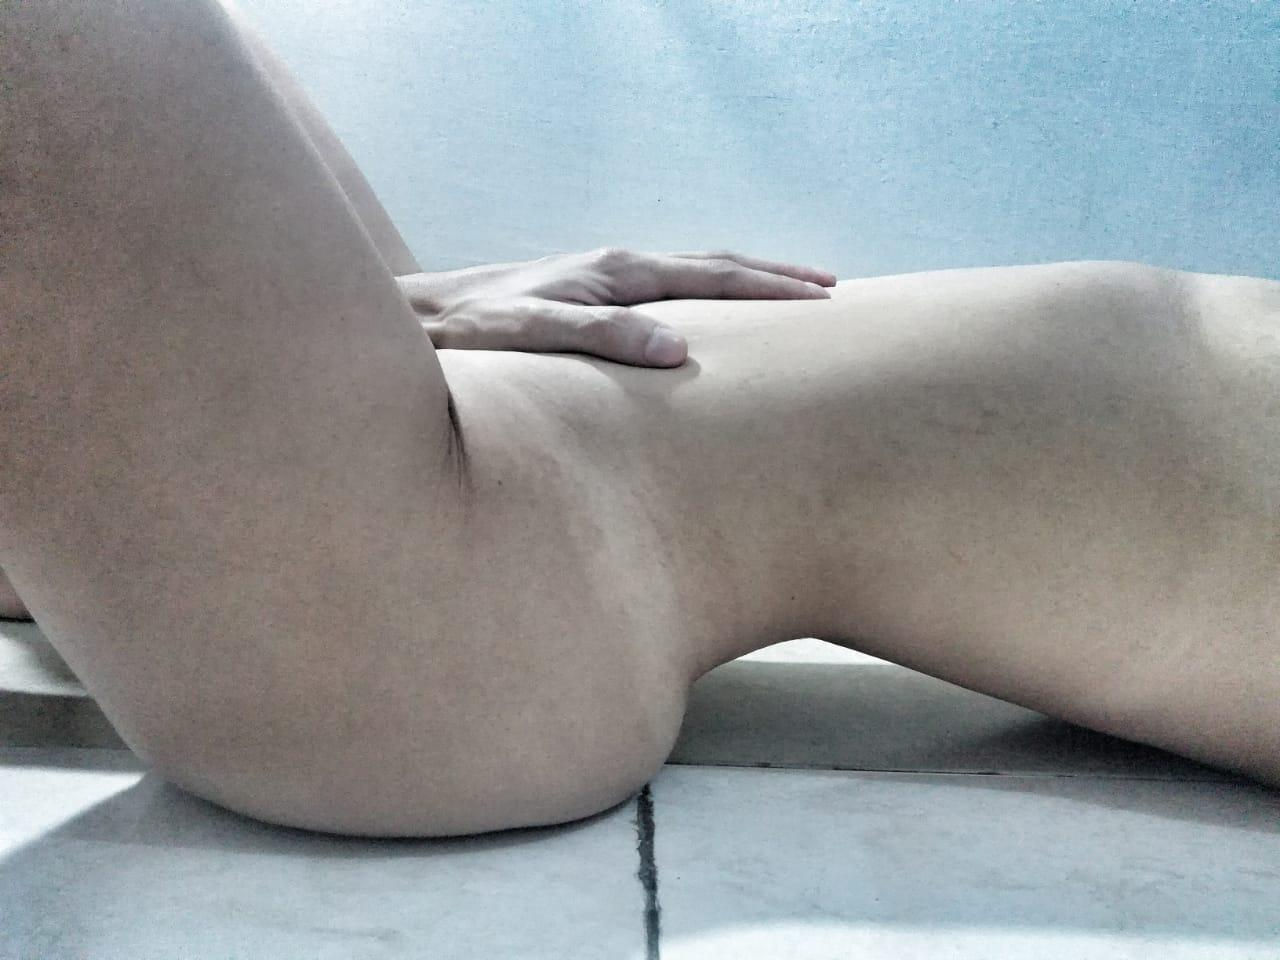 Sex horny?s=yptot+yhl4qlggspfkwuvlet4ocahiwahvkqilw0npa=